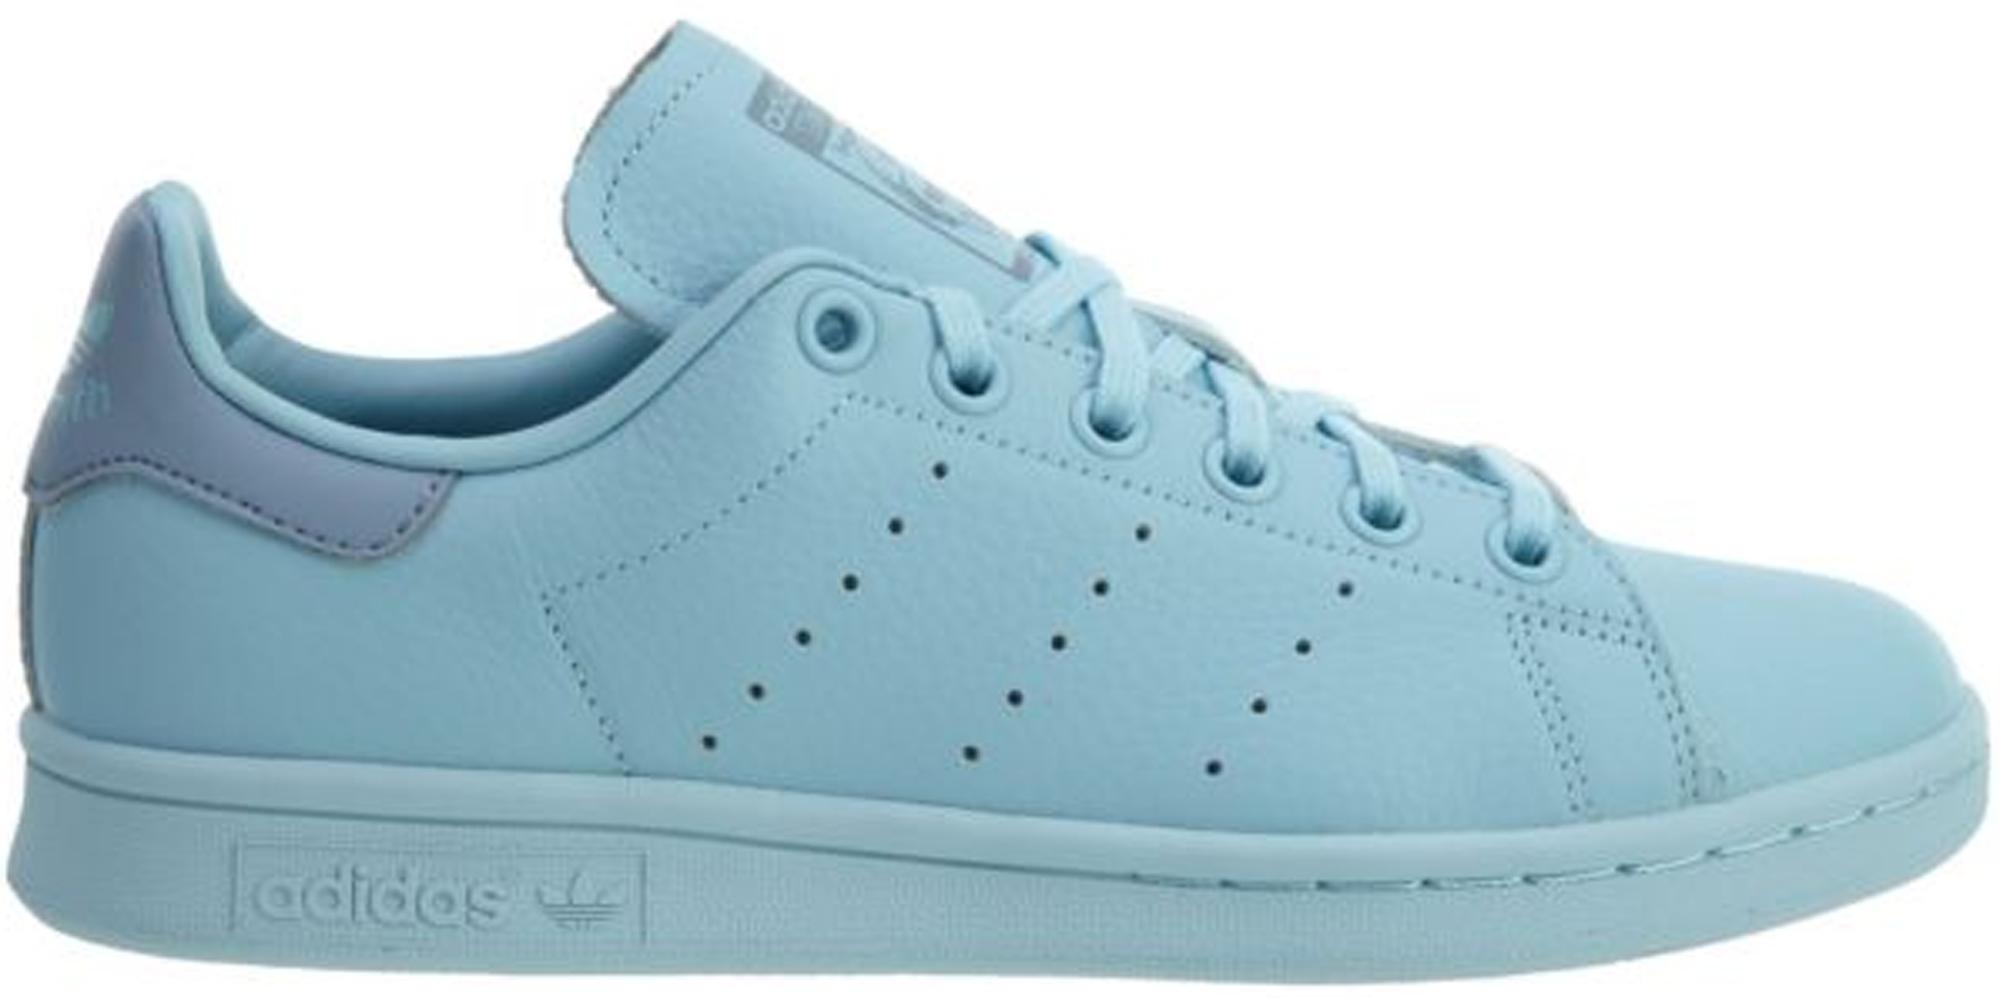 adidas Stan Smith Ice Blue (GS)